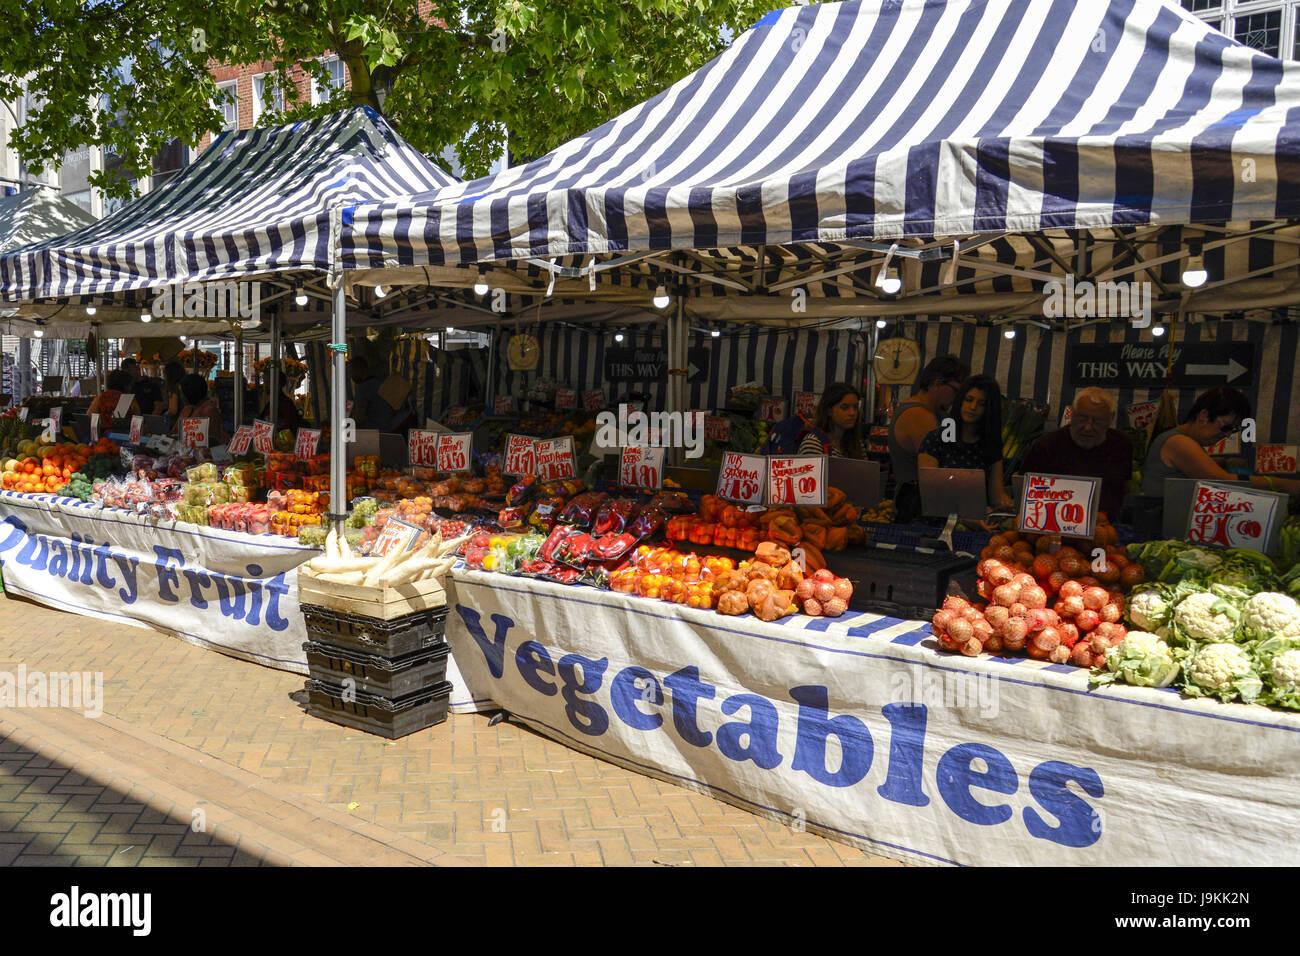 Friday Market, High Street, Chelmsford, Essex, England, UK - Stock Image